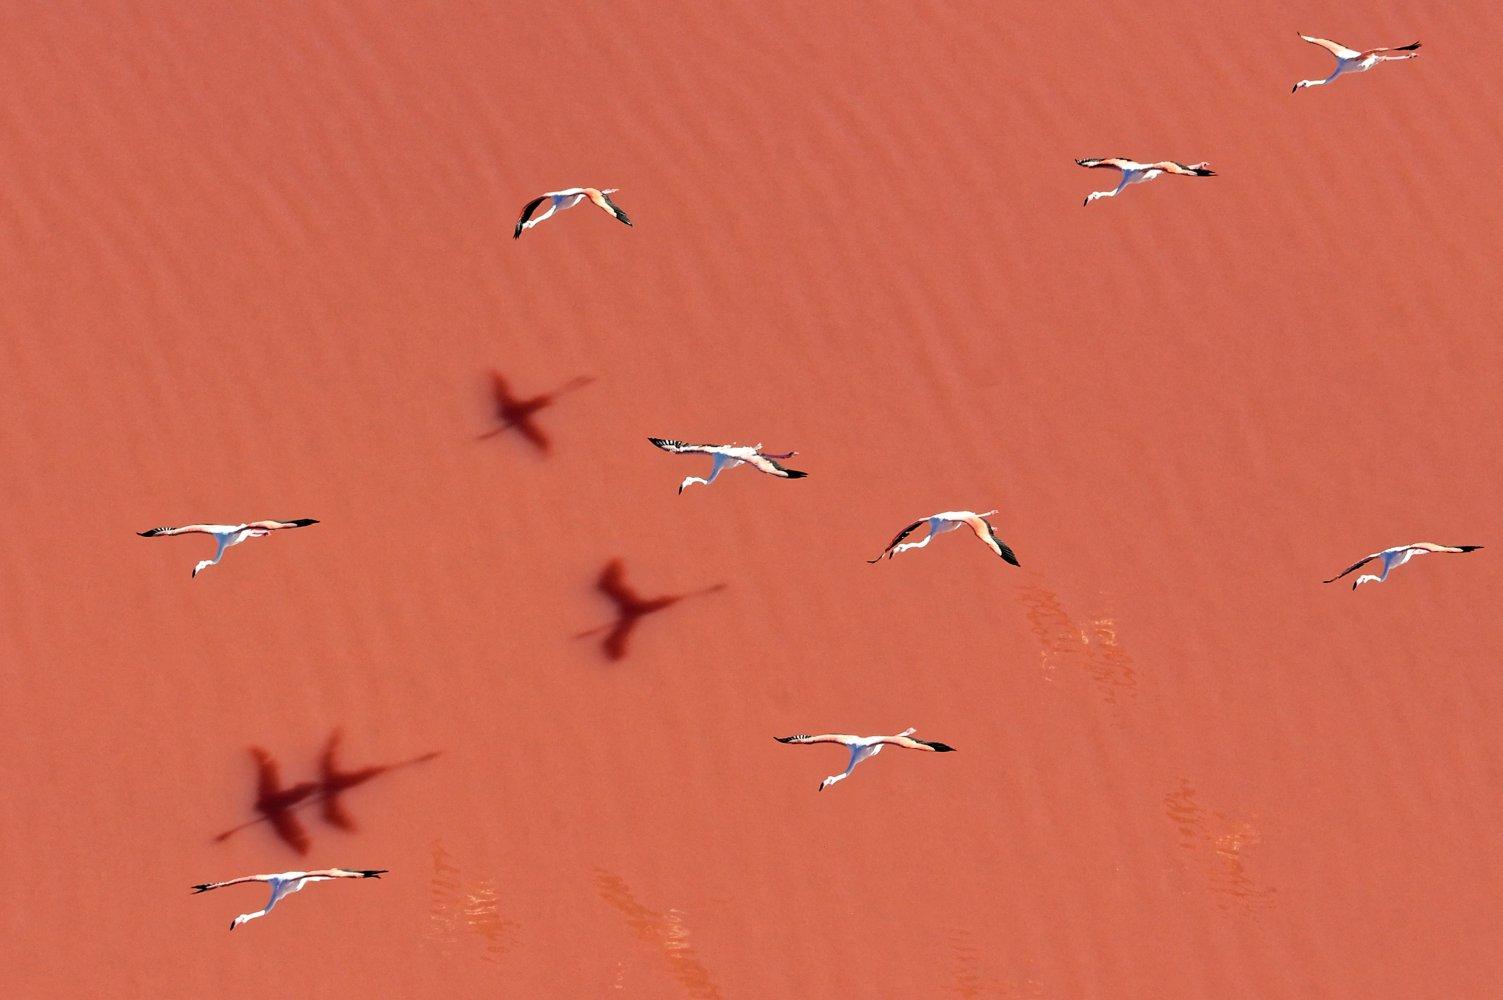 Observeer de vogels